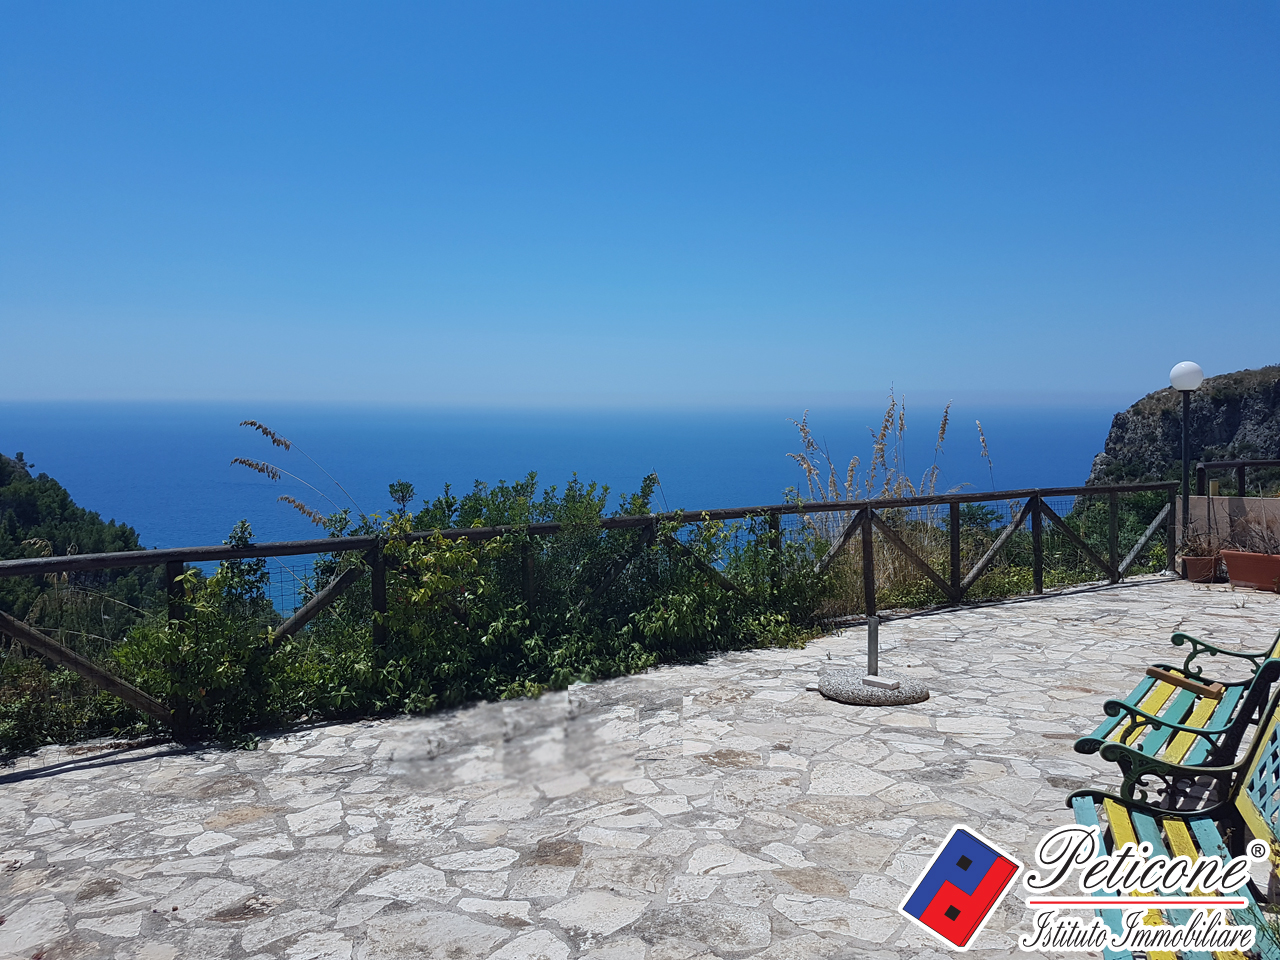 Villa in Vendita a Sperlonga: 4 locali, 90 mq - Foto 5